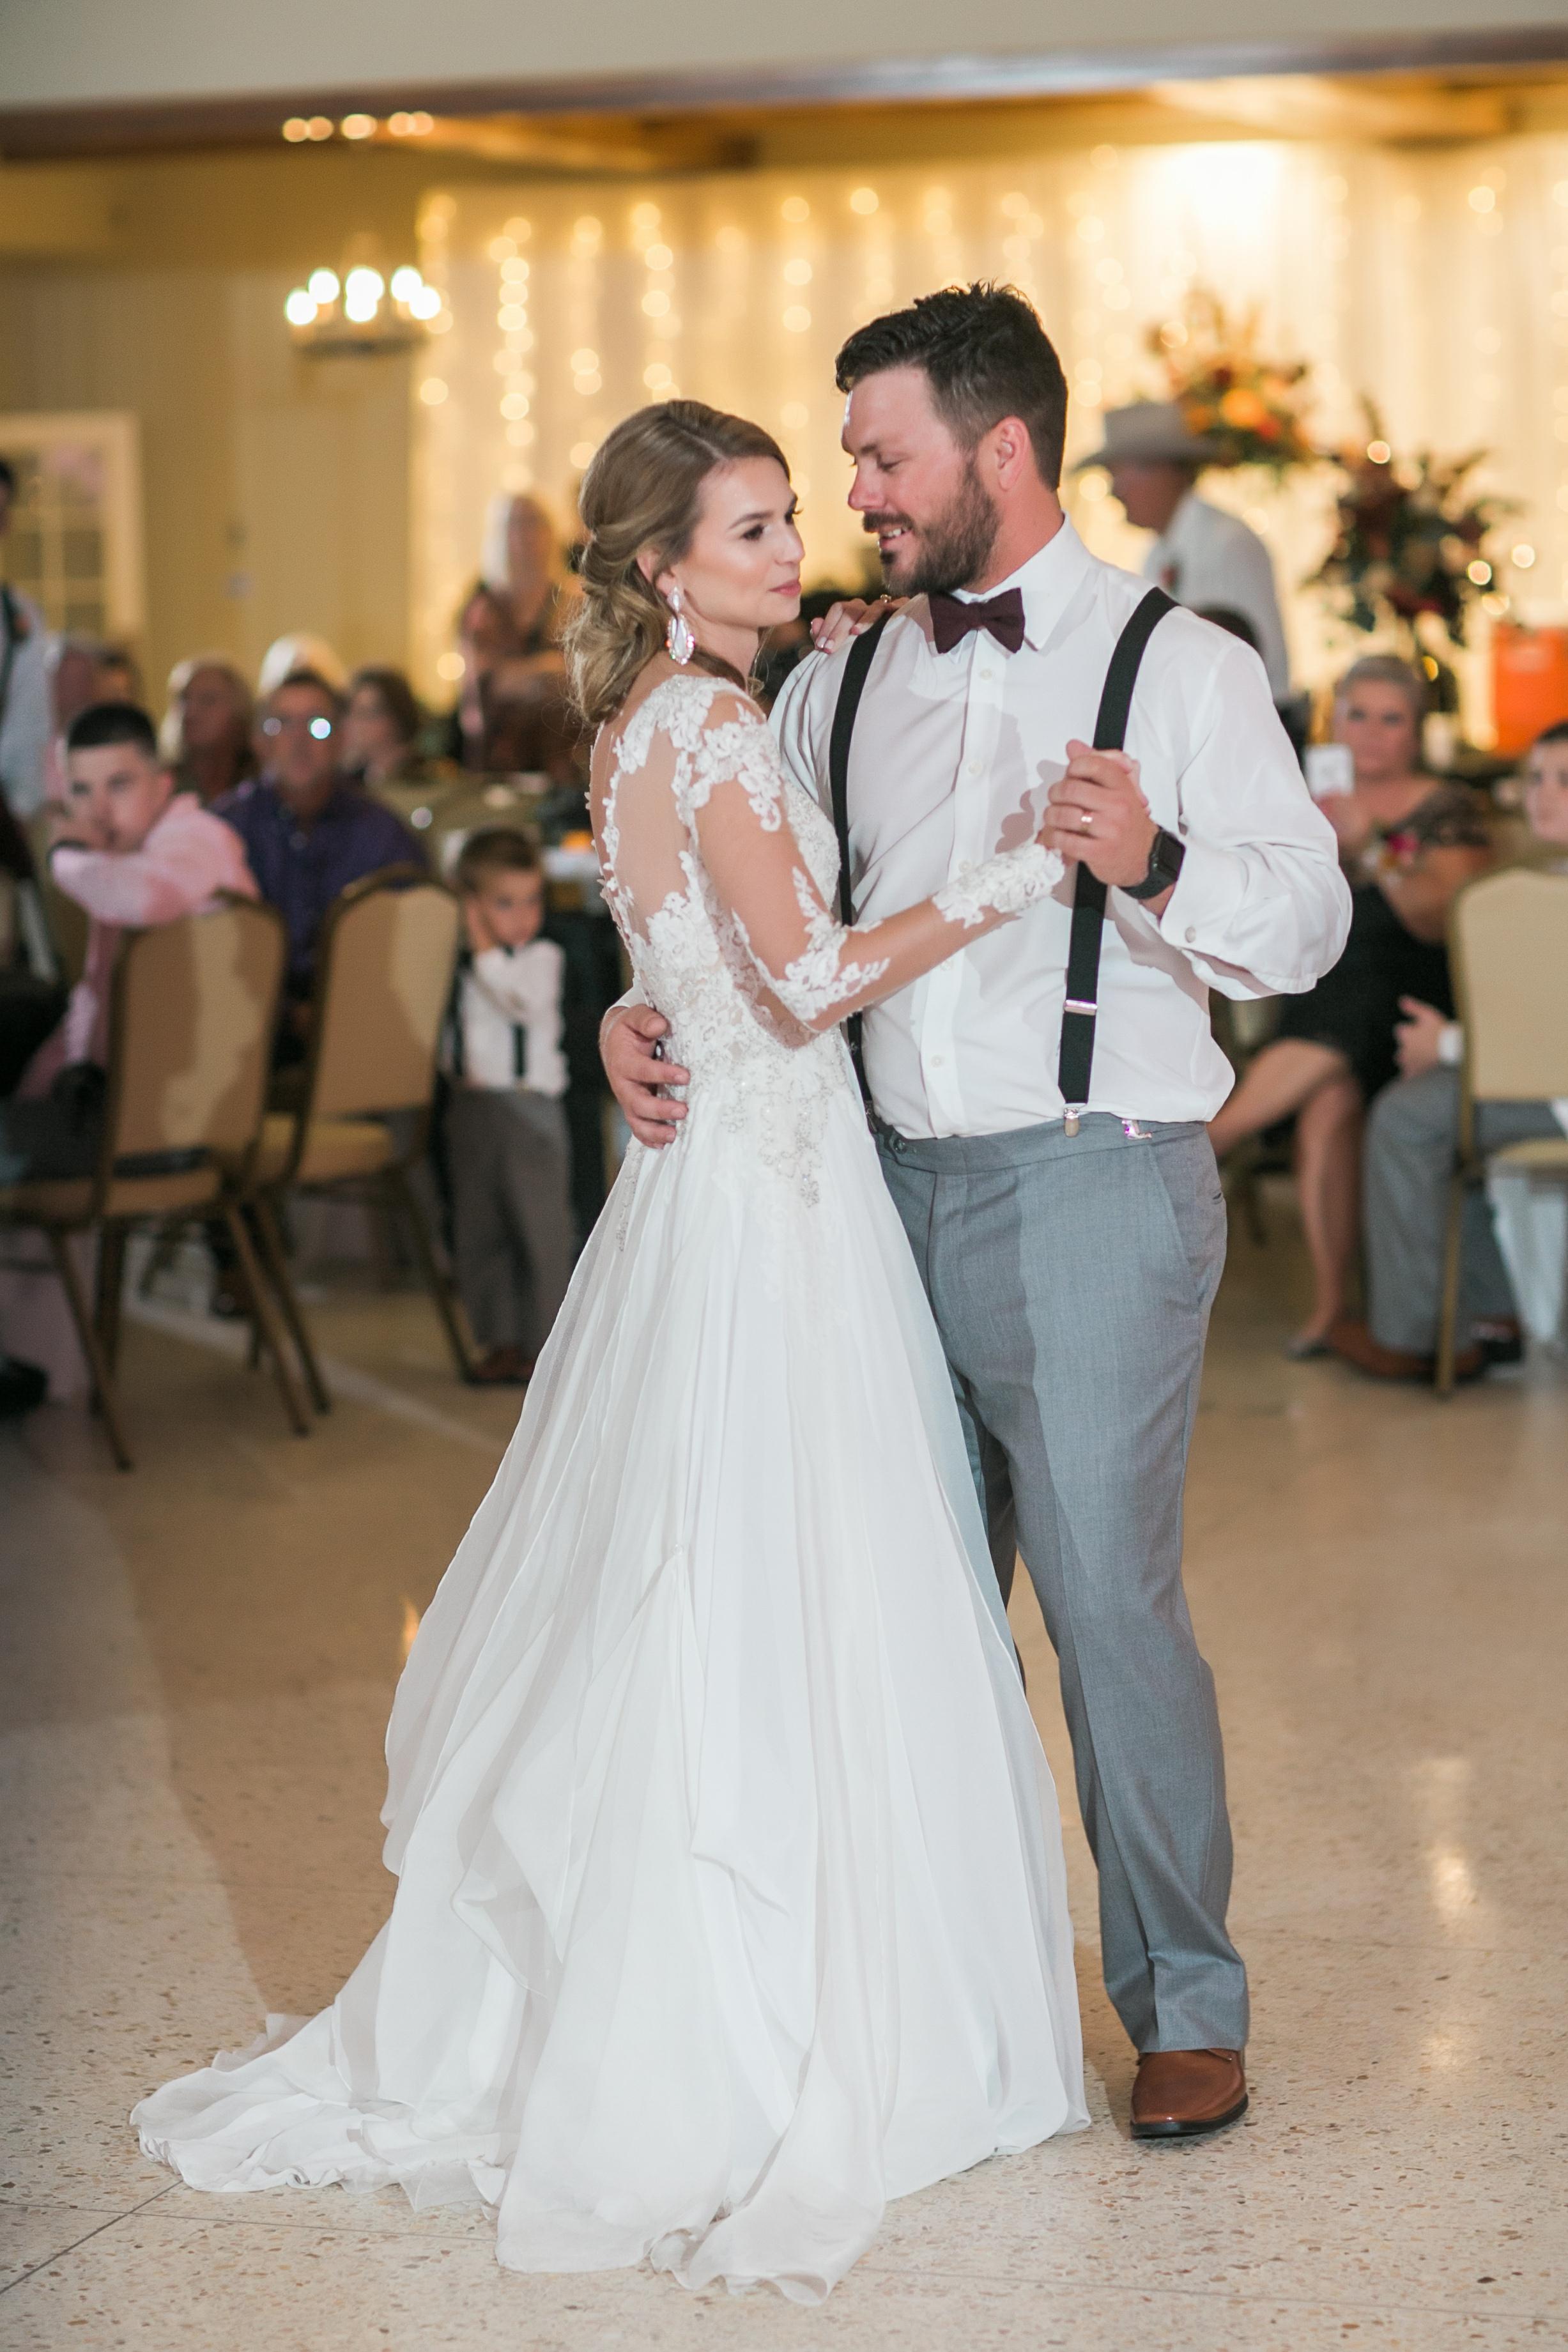 Roberson-Wedding-The-Forum-Lauren-Pinson-Wedding-Photography-Wichita-Falls-Texas-080.jpg